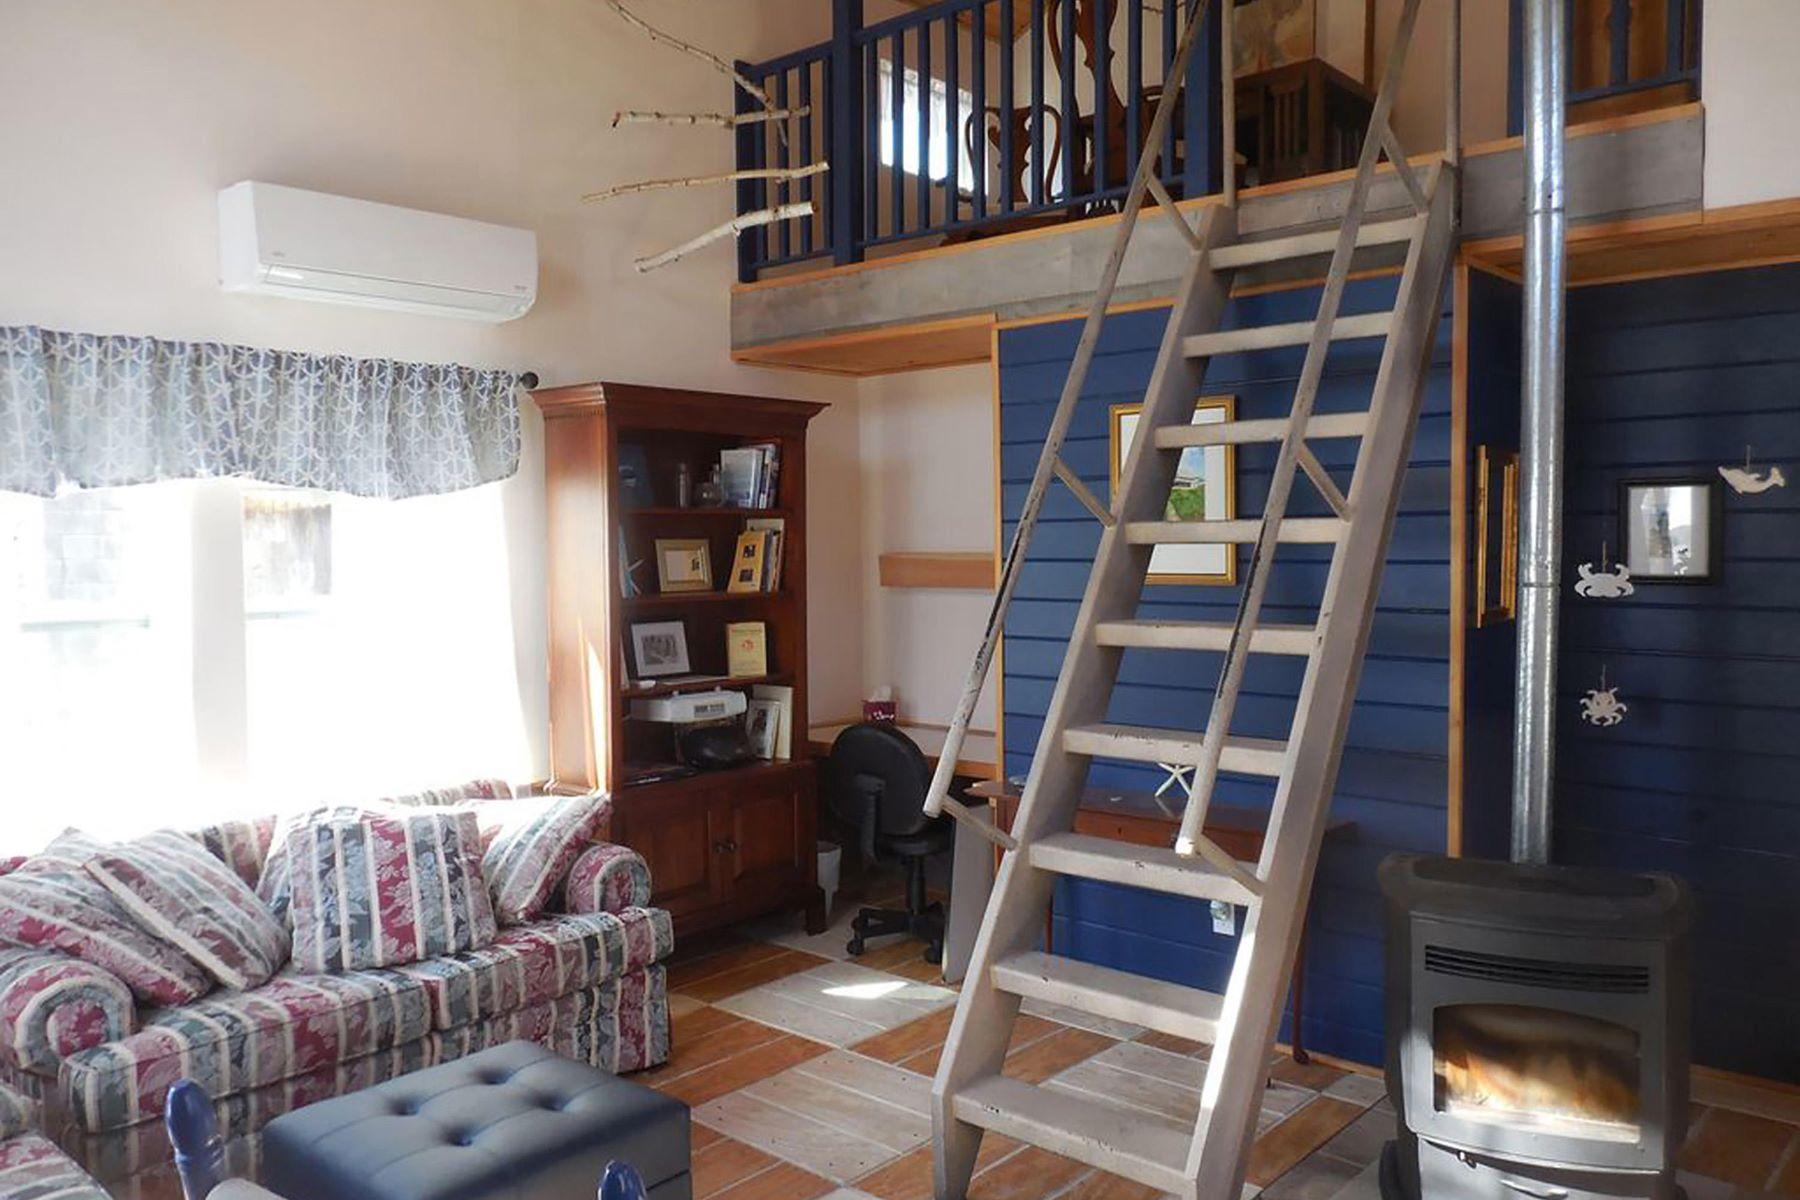 Single Family Homes for Sale at 21 Kilgore Lane Long Island, Maine 04050 United States